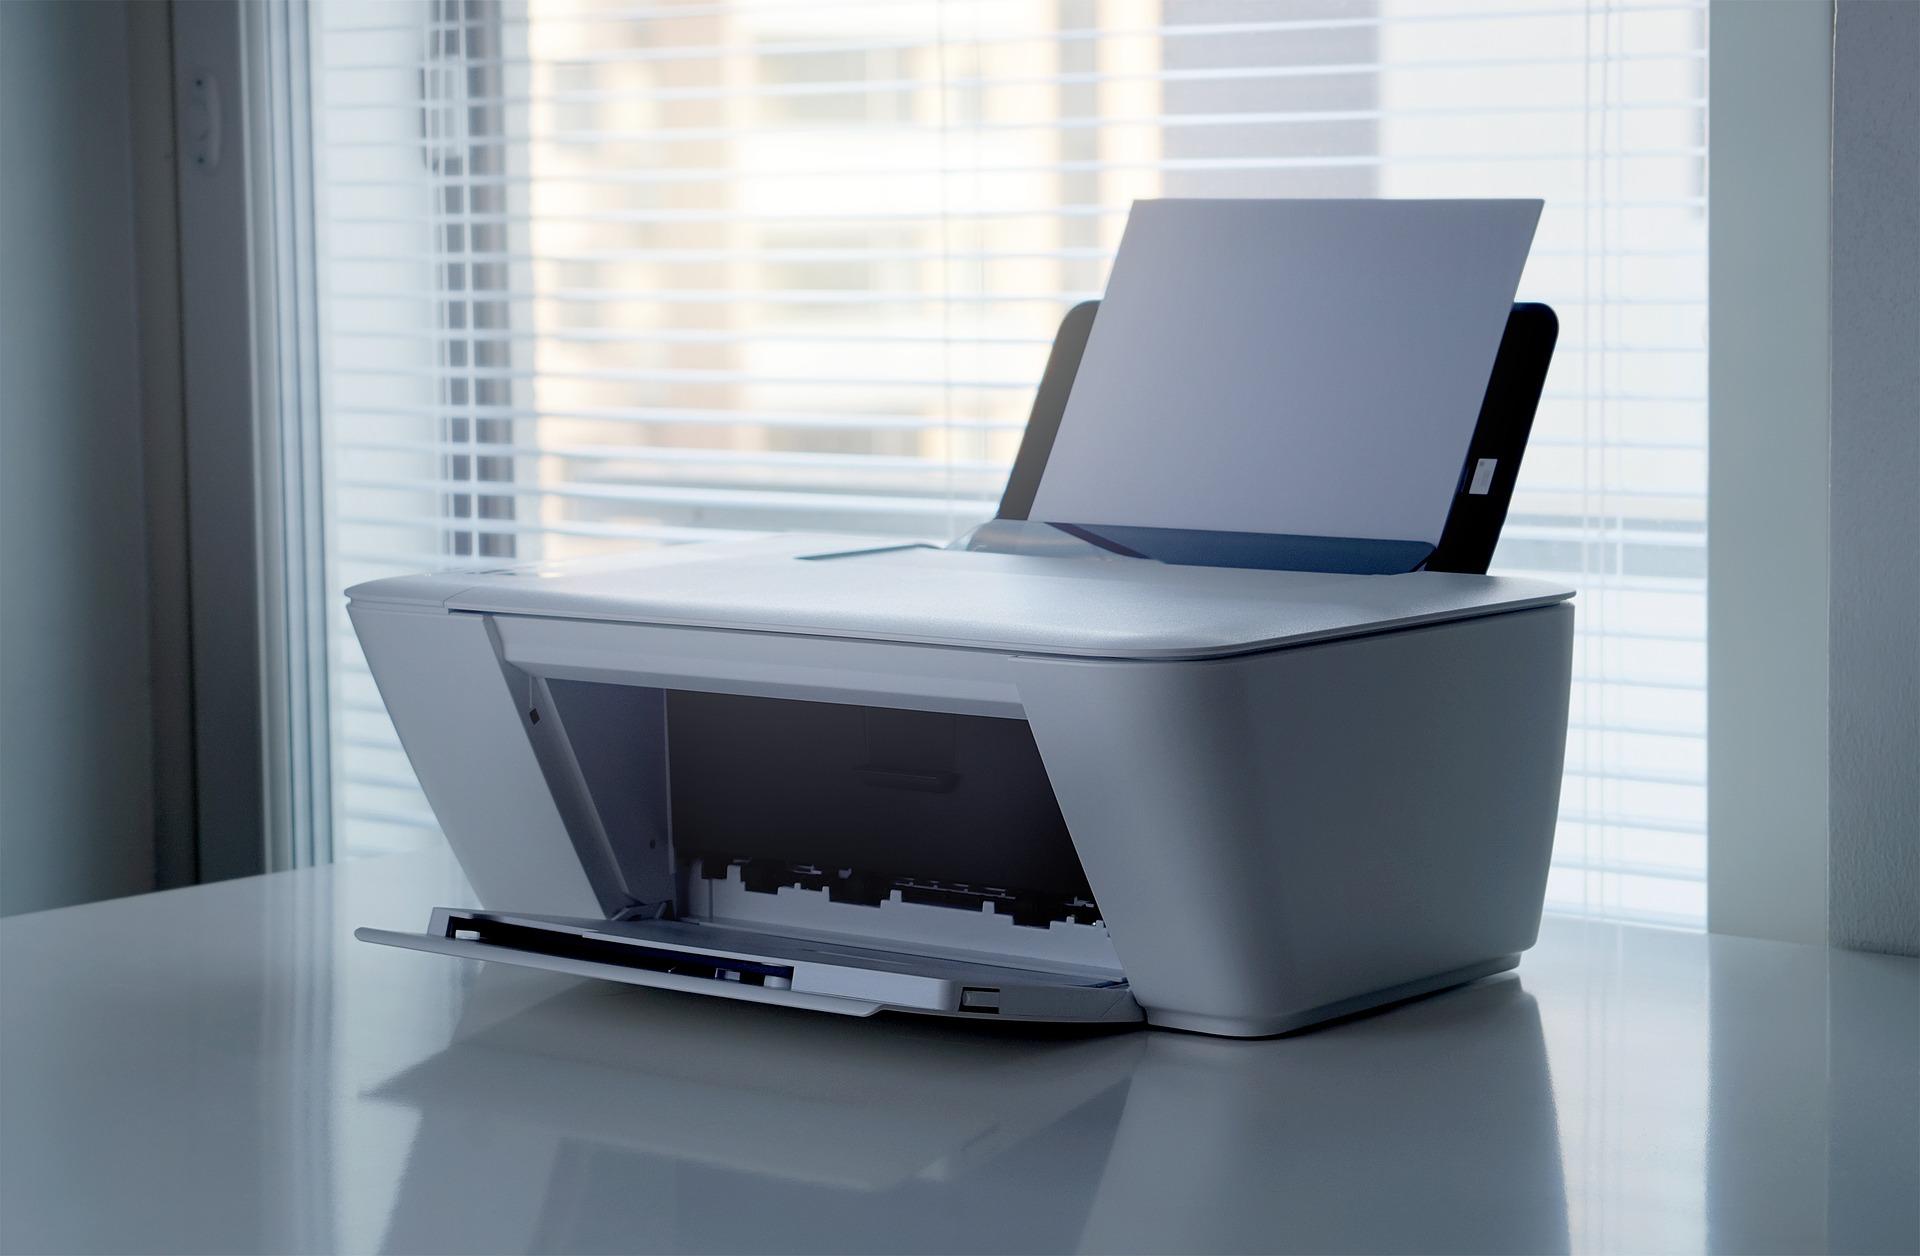 dobra drukarka laserowa do domu